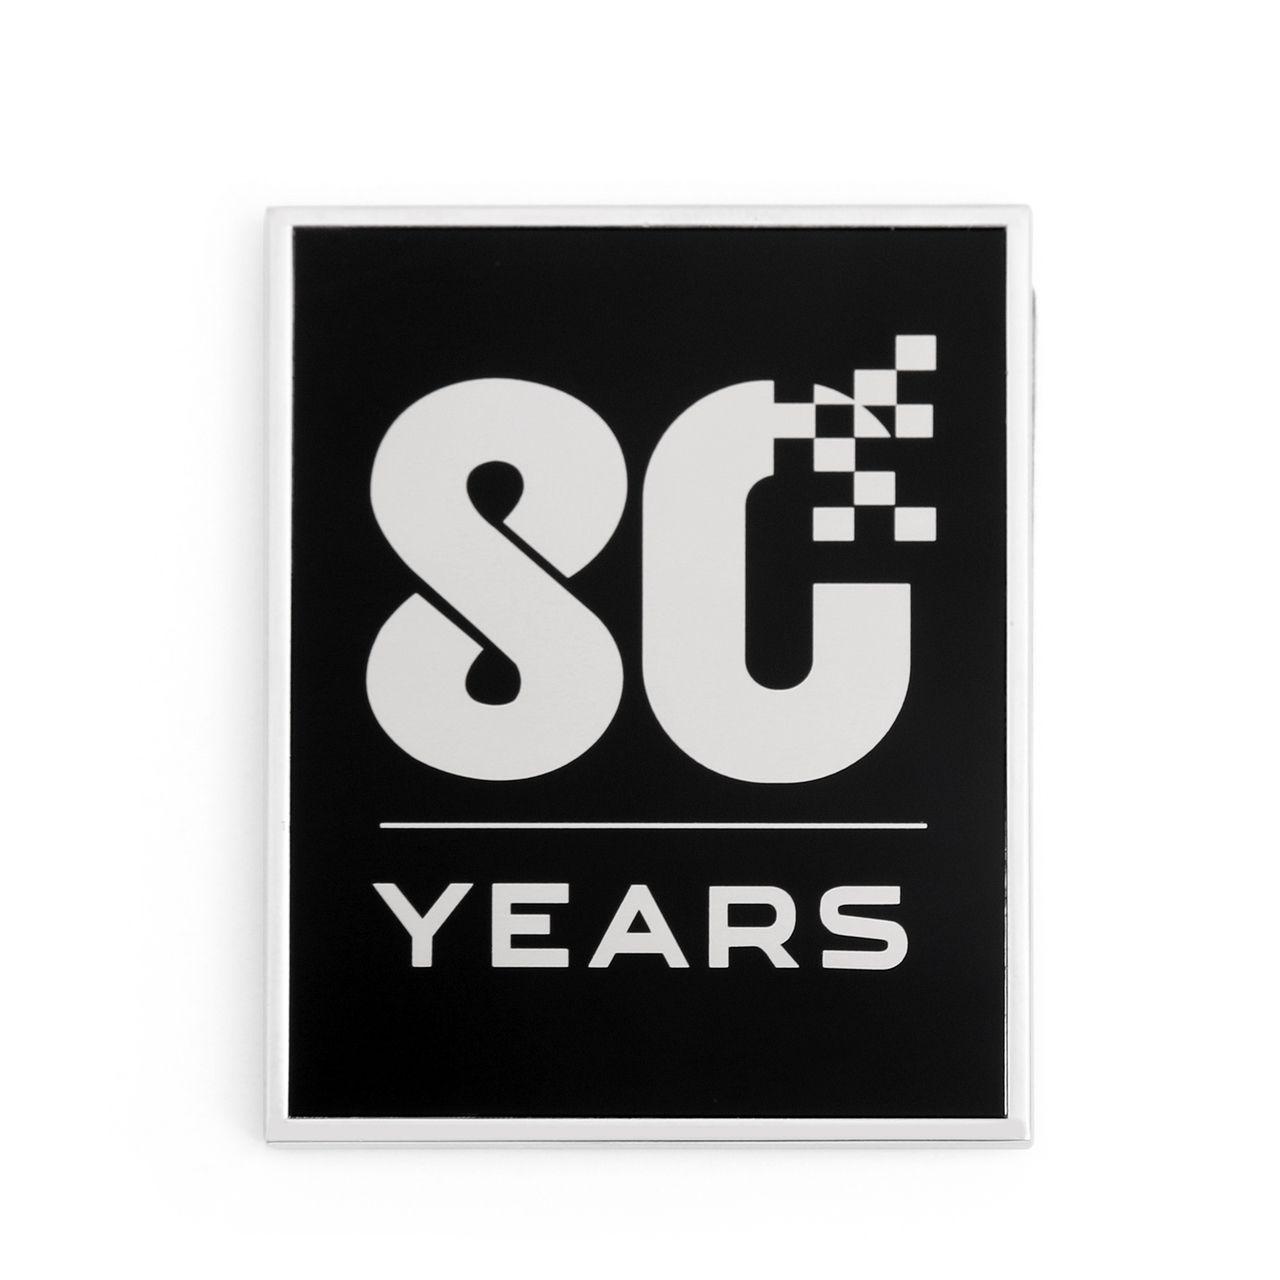 Mad 3D Metal 80 Years Anniversary Emblem Badge